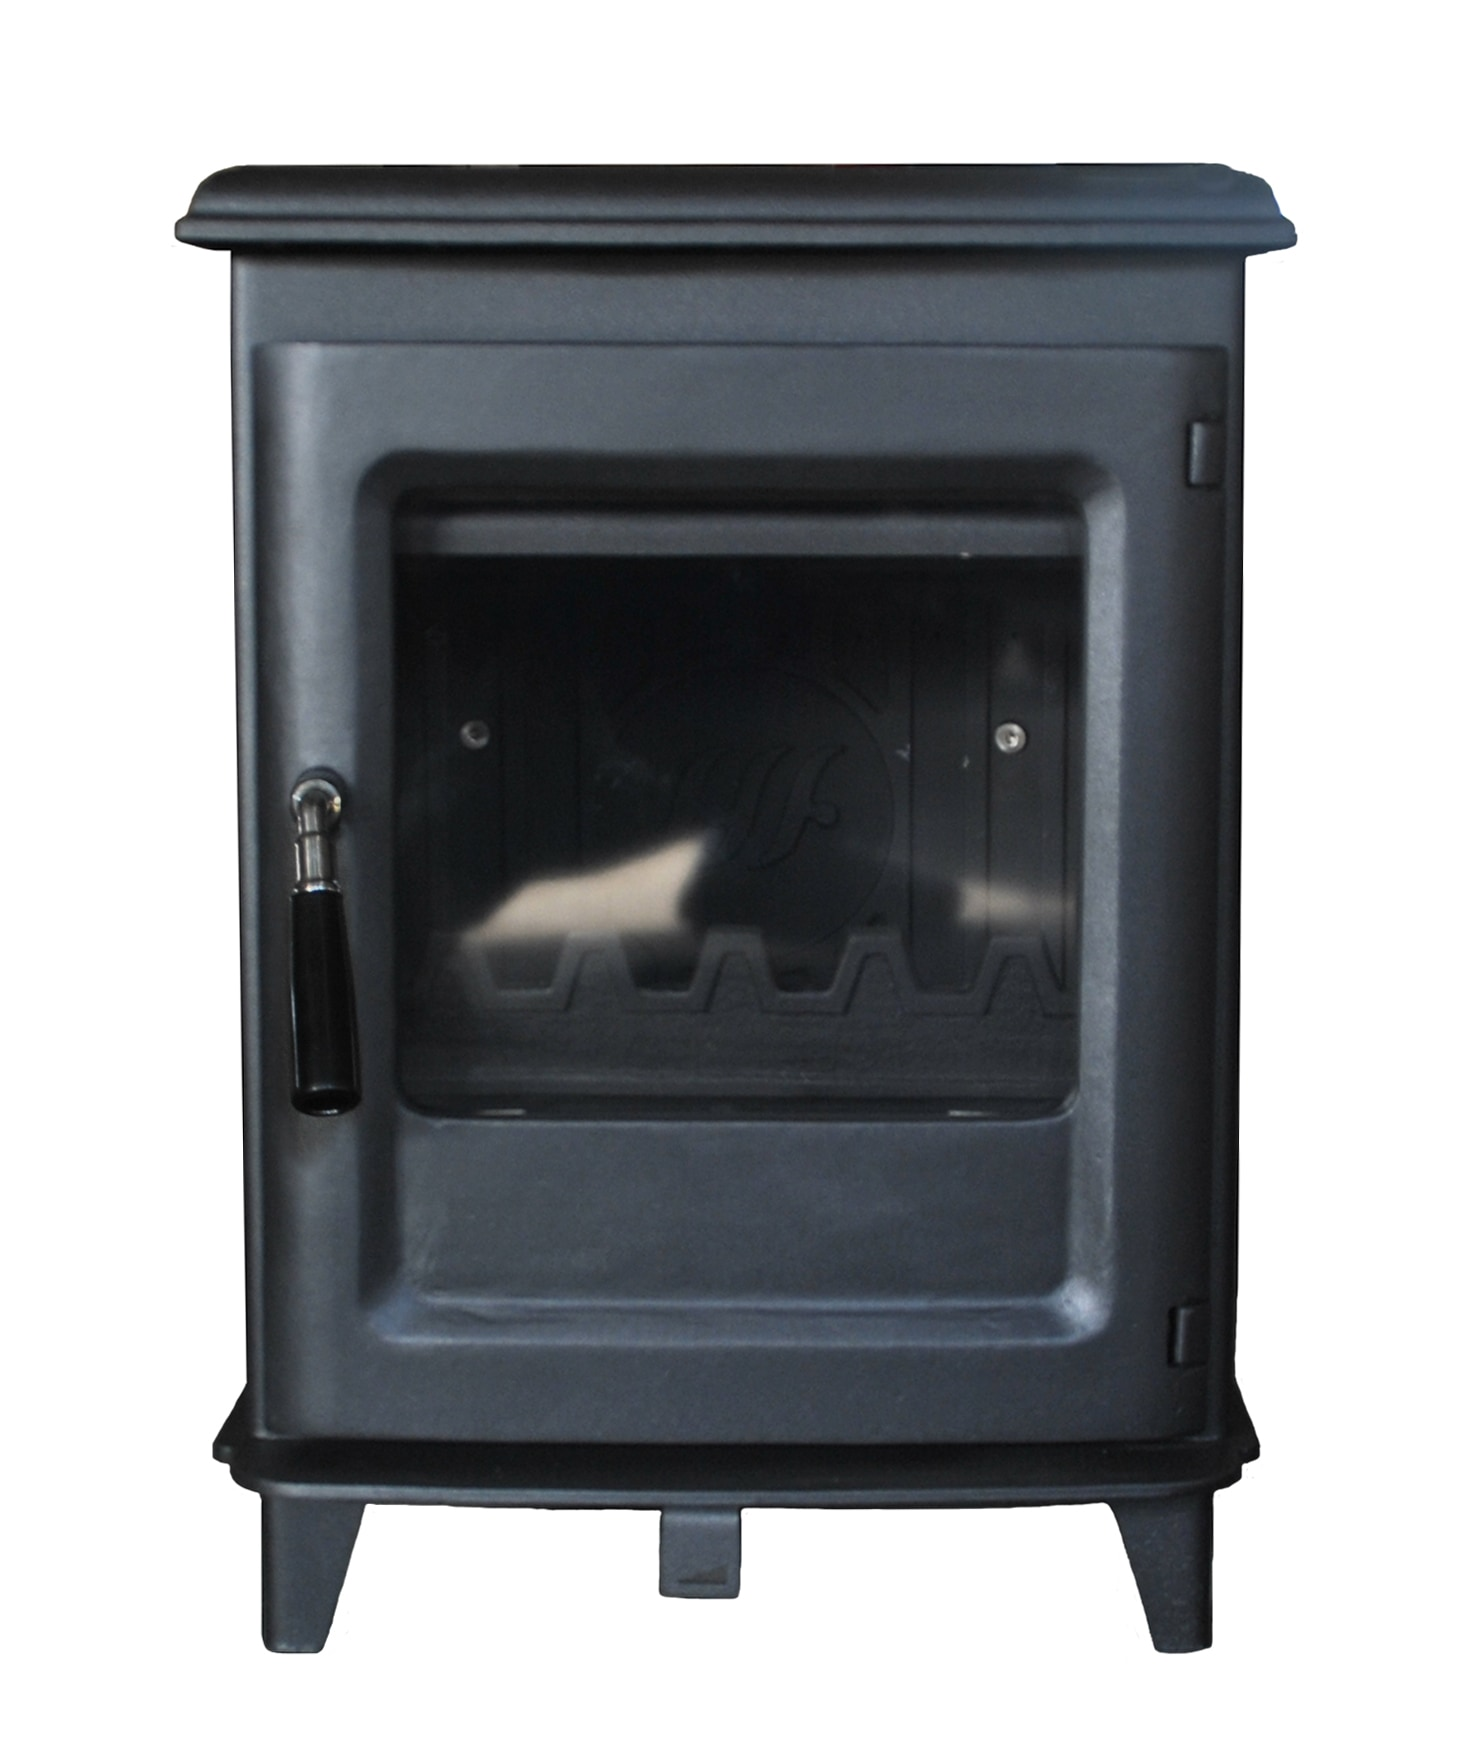 hi flame hiflame olymberyl hf905ub small 800 sq feet wood burning